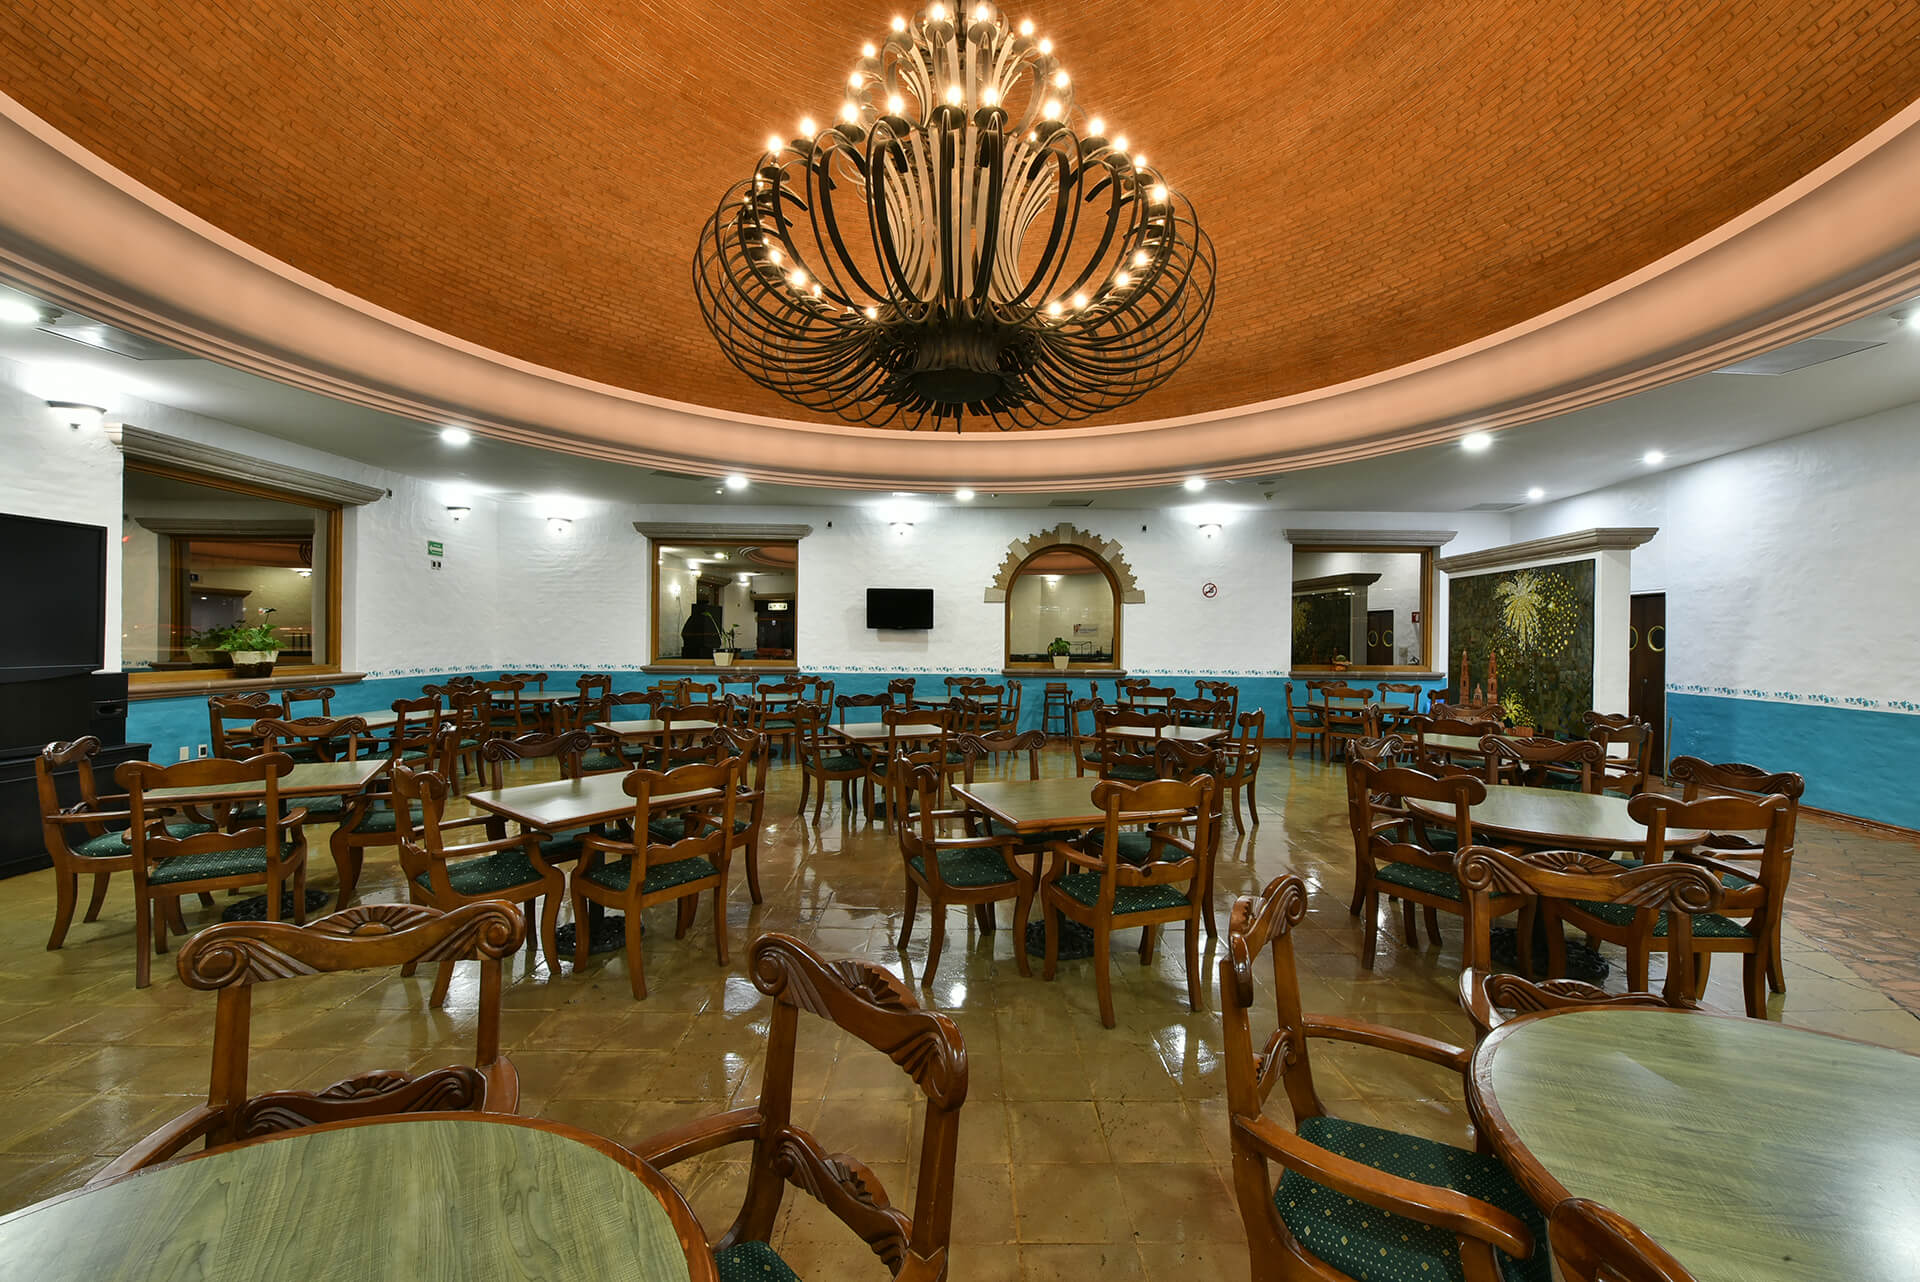 Holiday Inn Express Morelia - Imagen 7